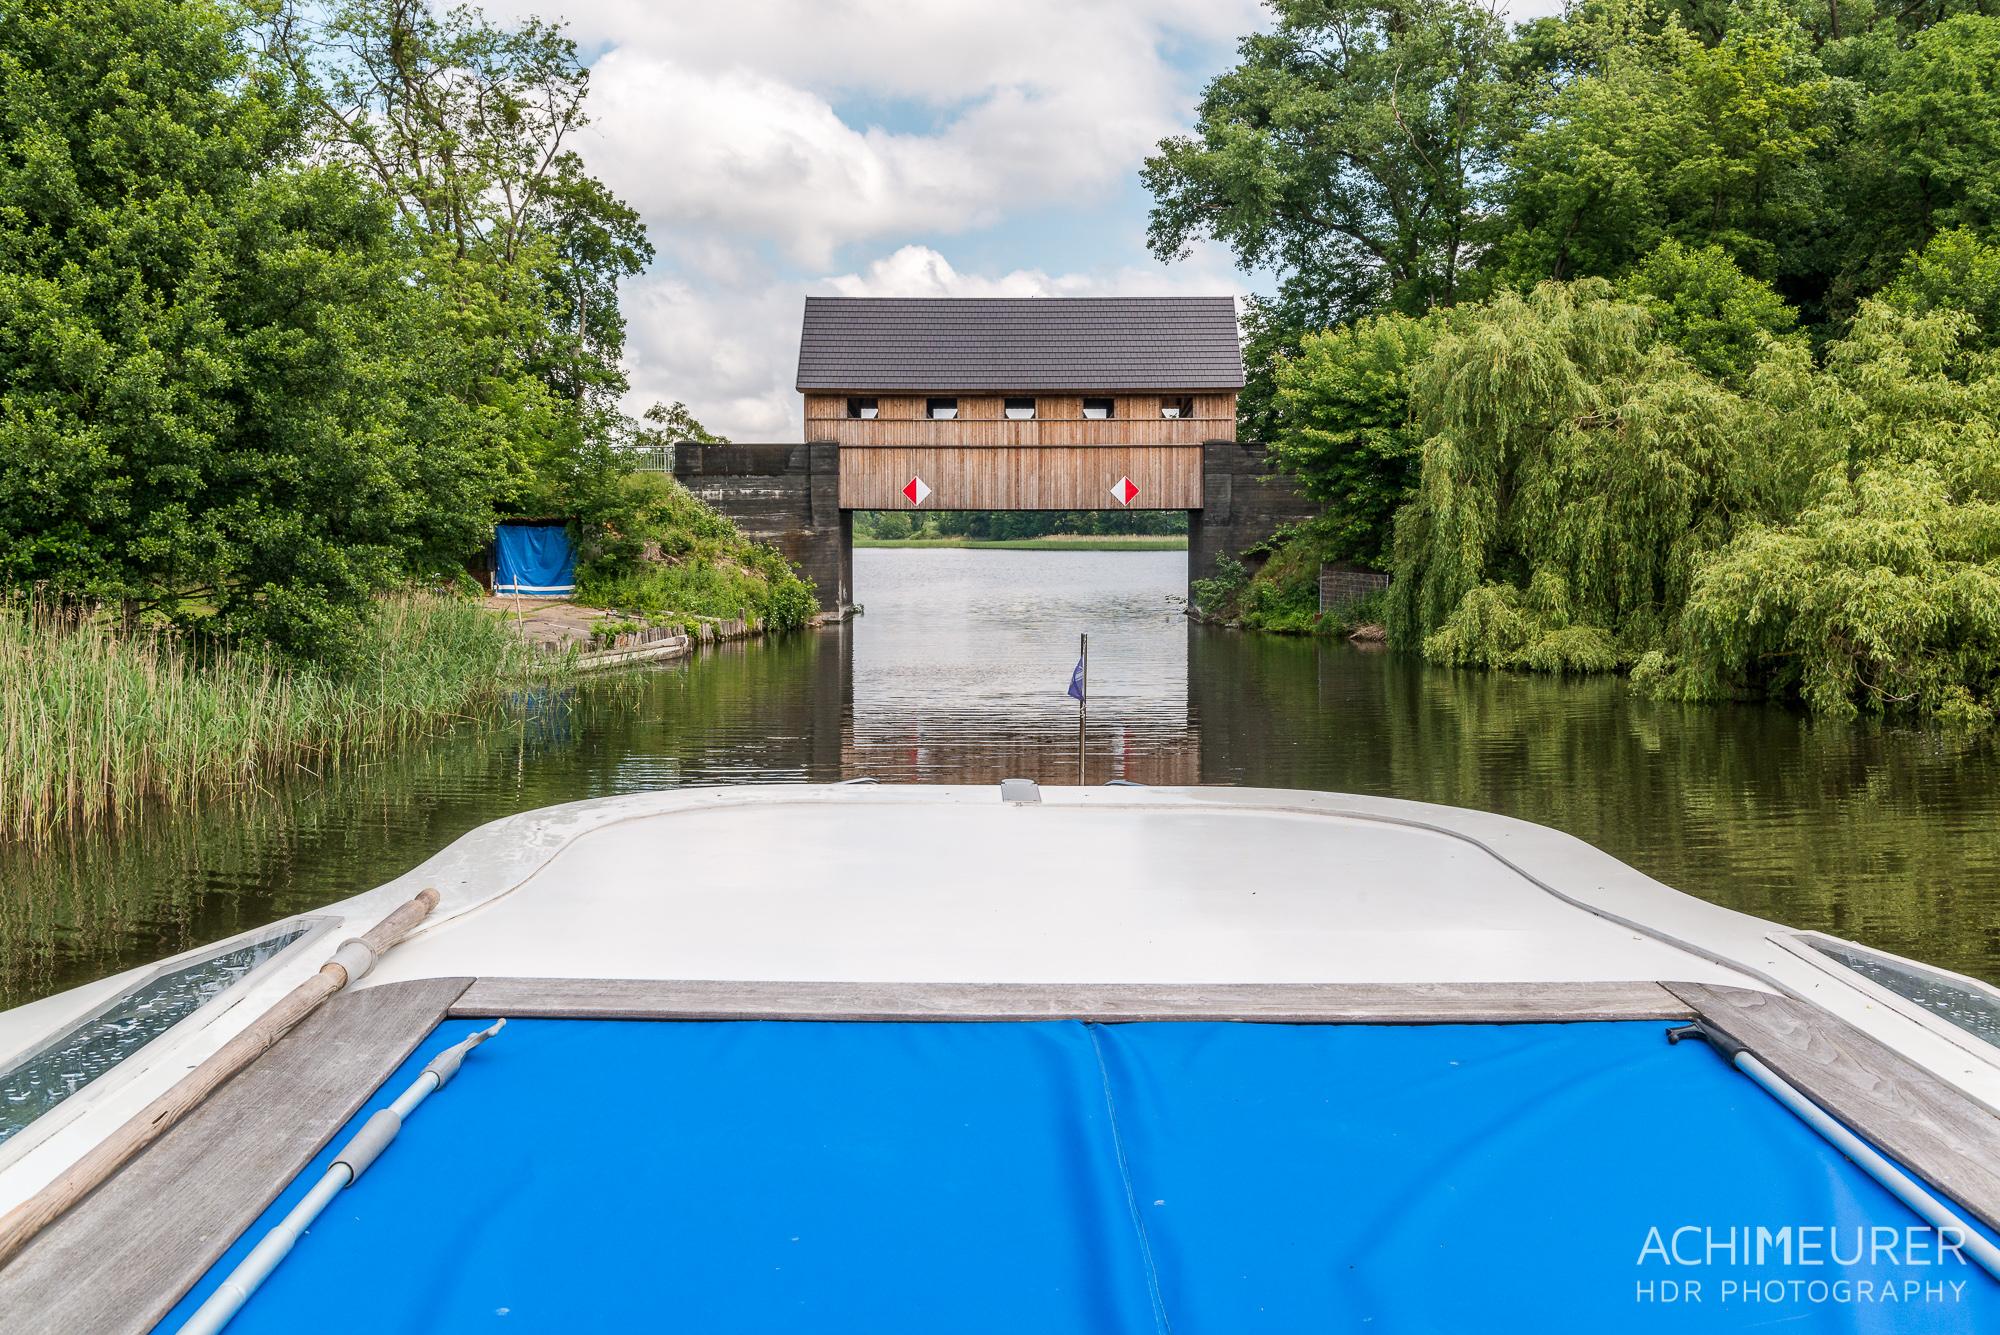 Hausboot-Kuhnle-Mueritz-Mecklenburg-Vorpommern-See_2885